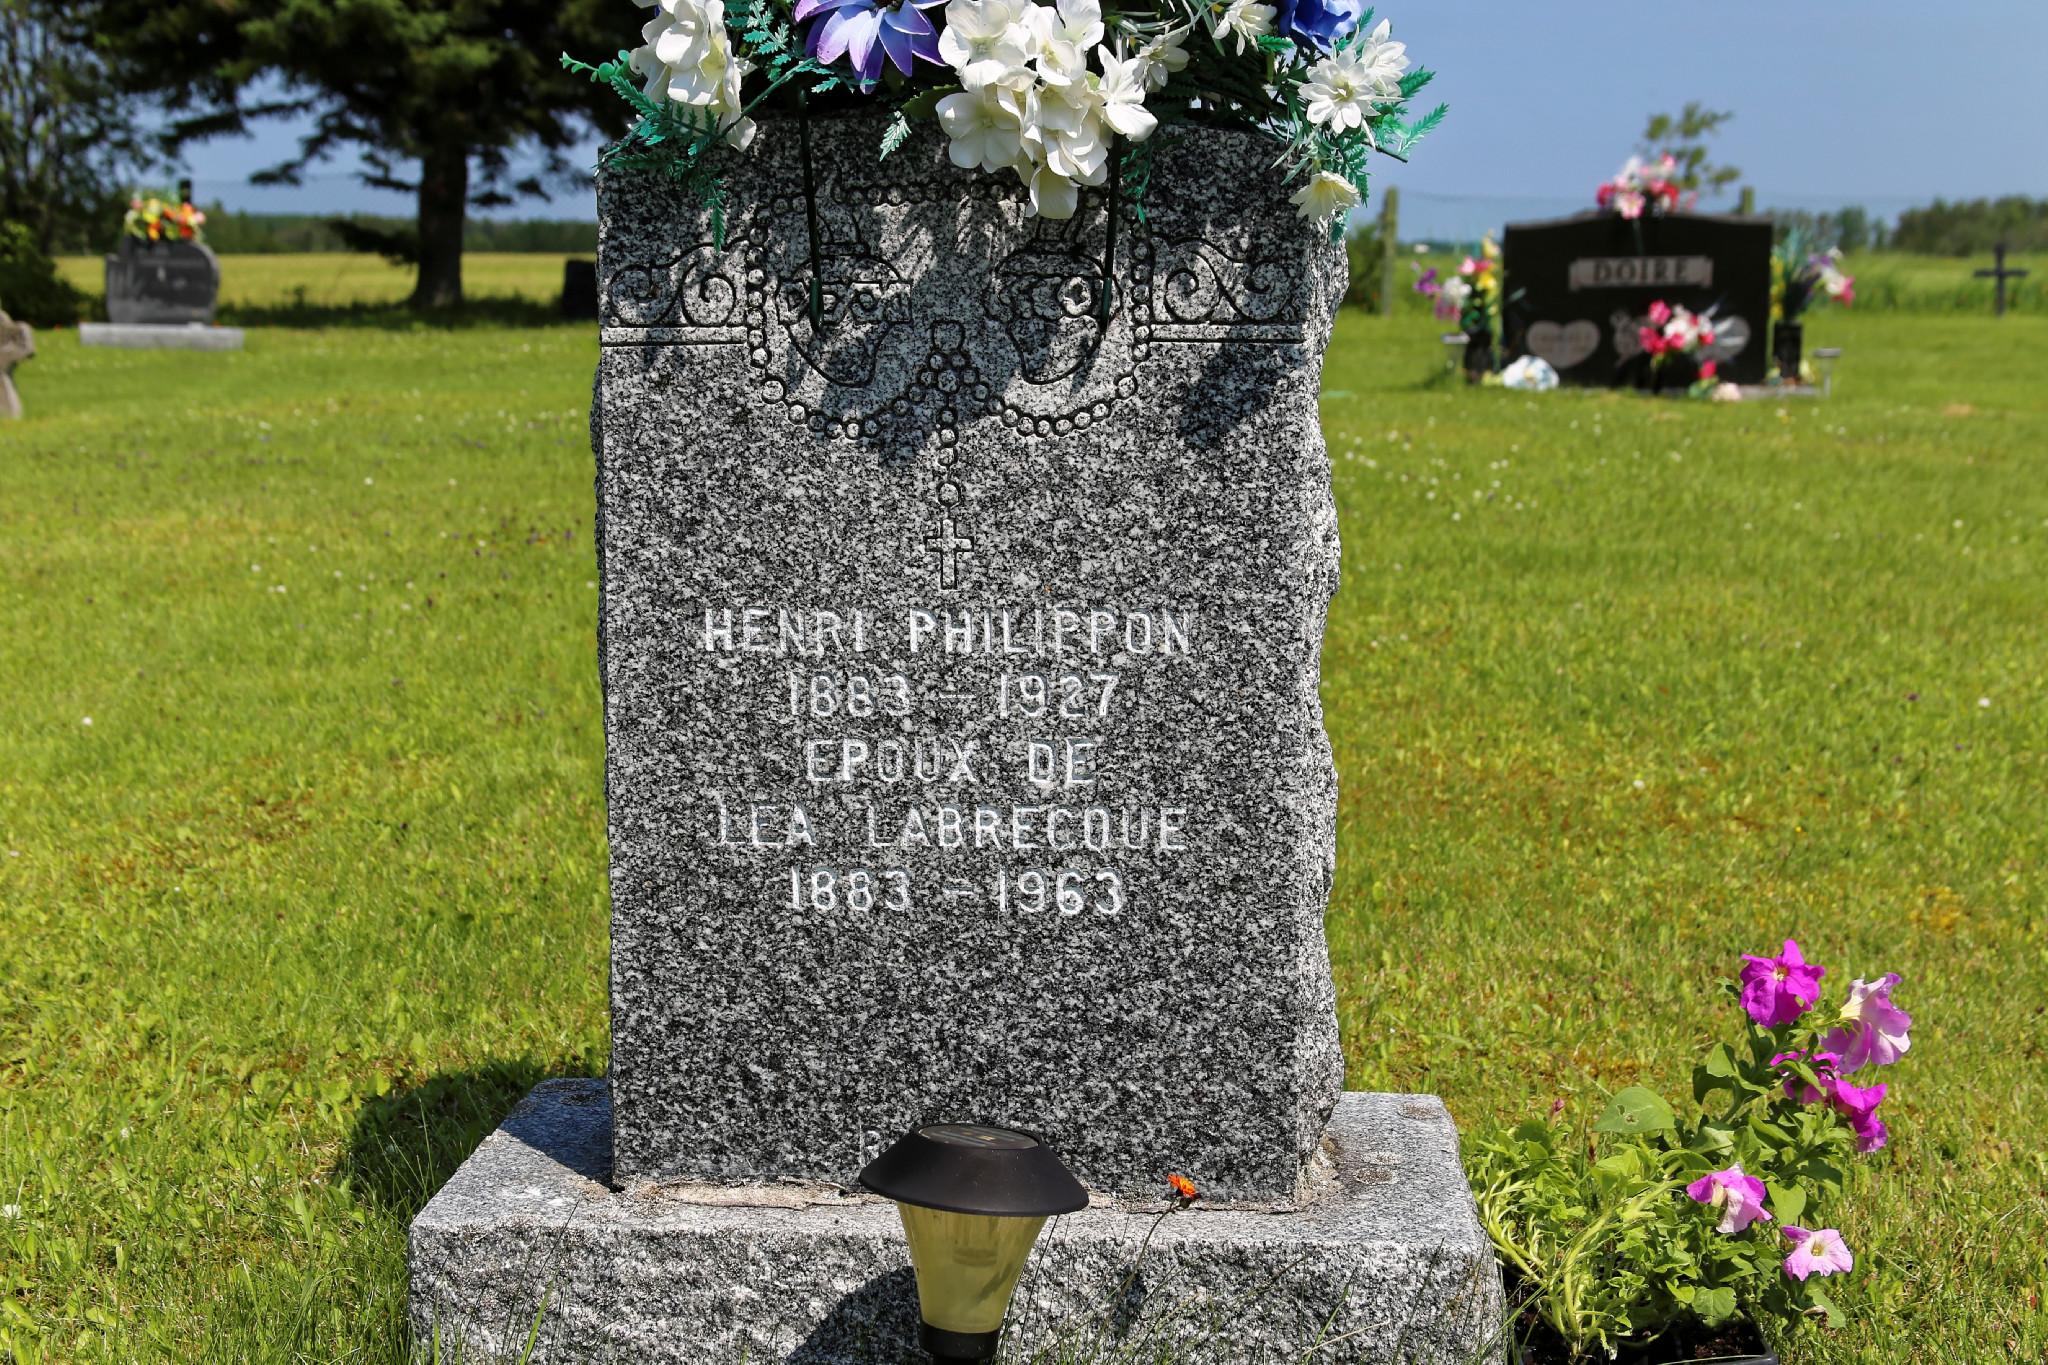 Henri Philippon